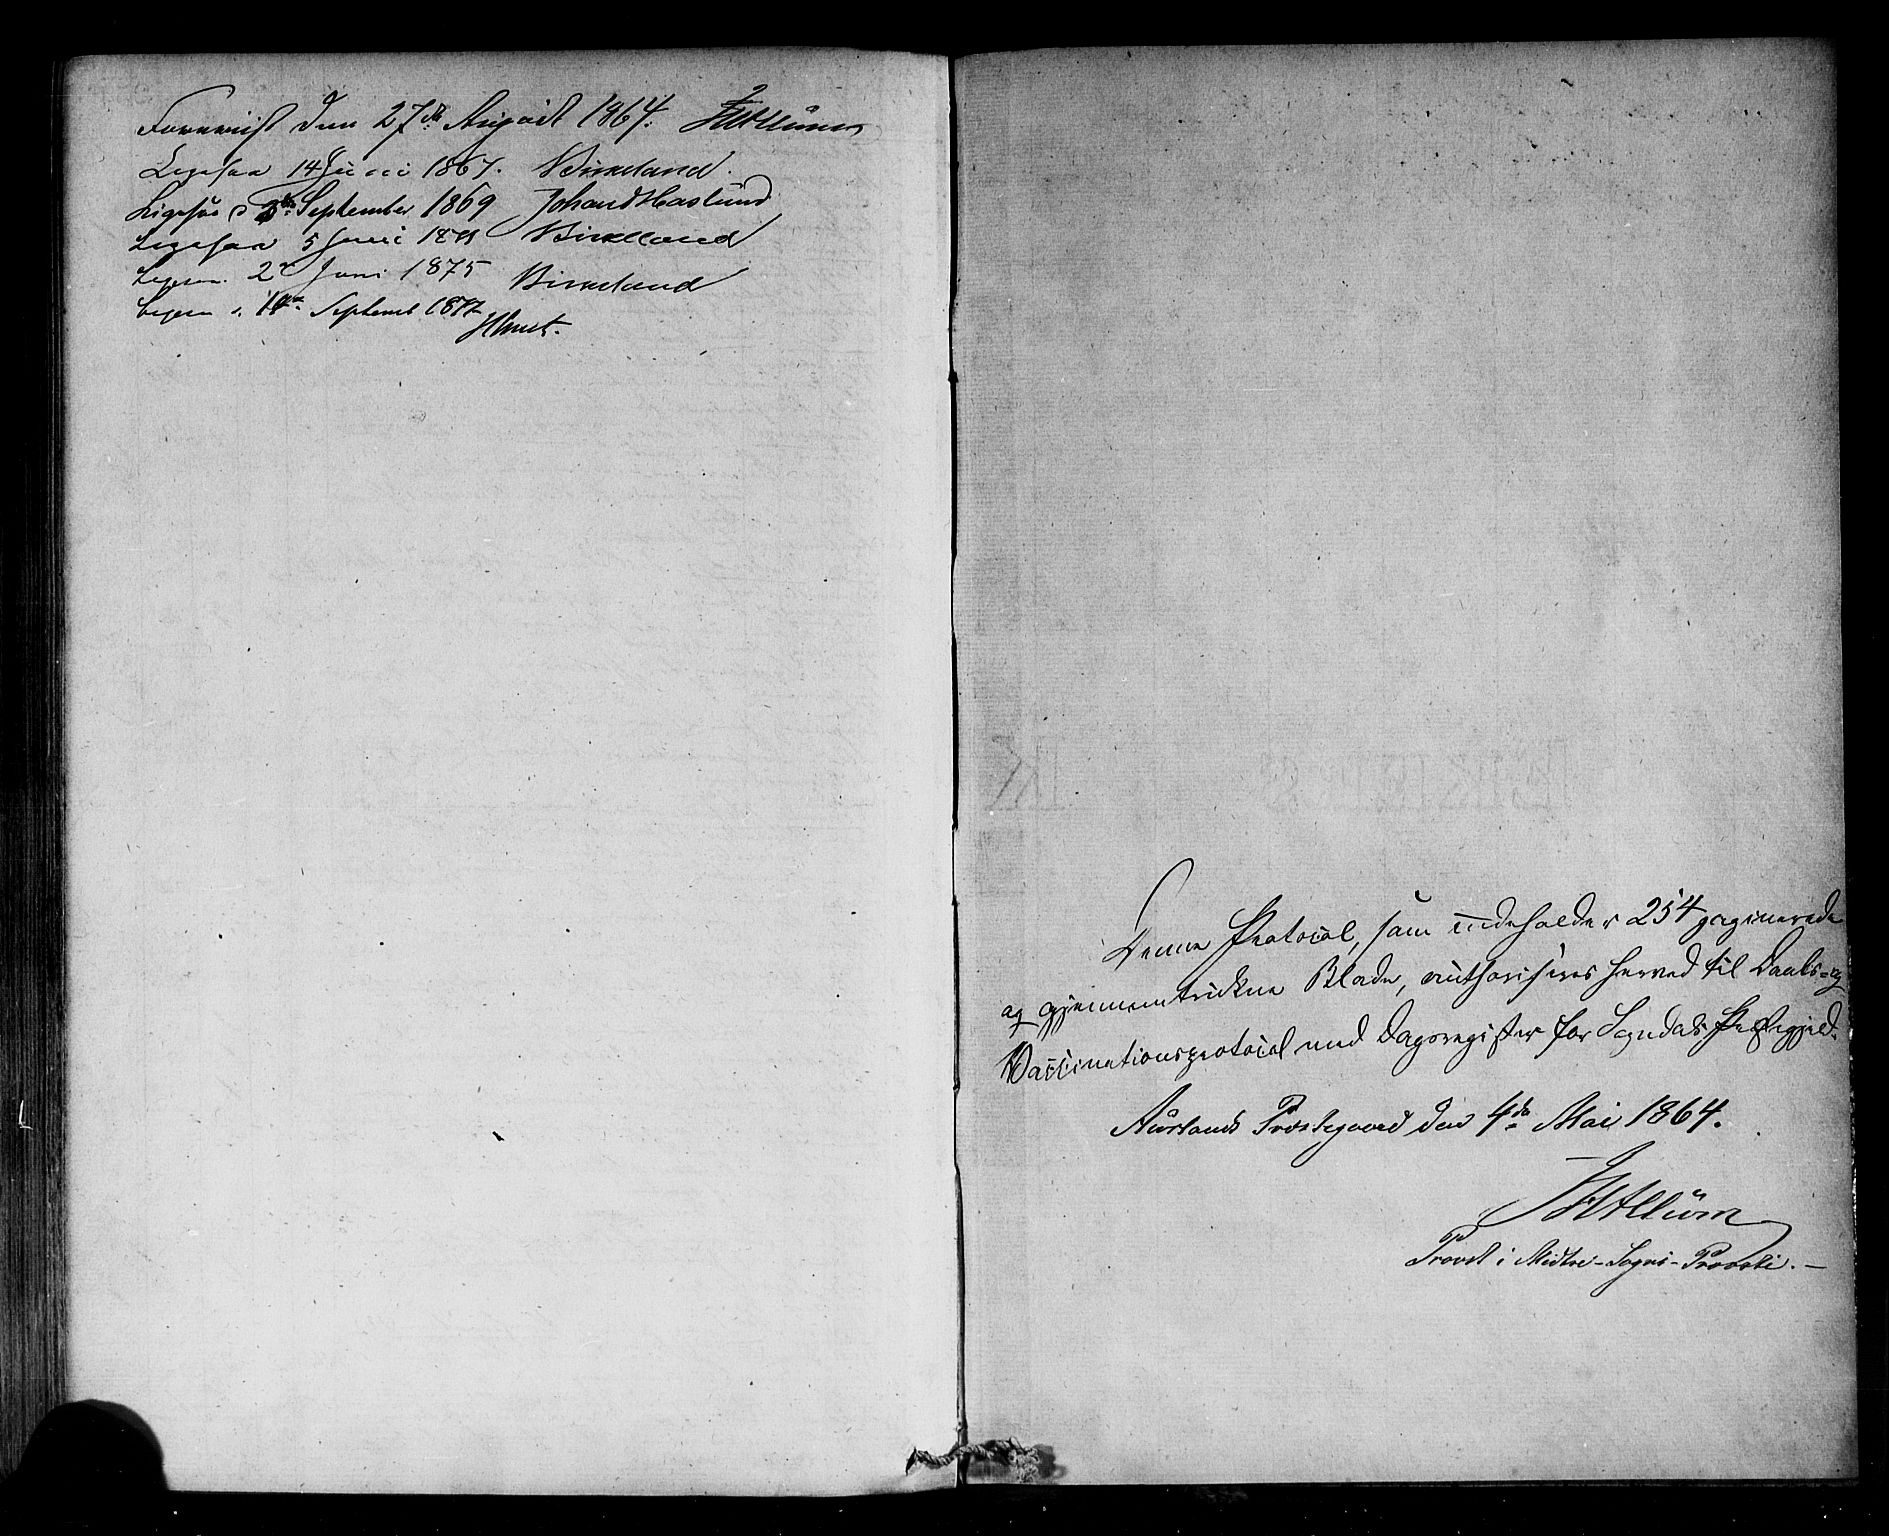 SAB, Sogndal Sokneprestembete, H/Haa/Haaa/L0014: Ministerialbok nr. A 14, 1864-1877, s. 255